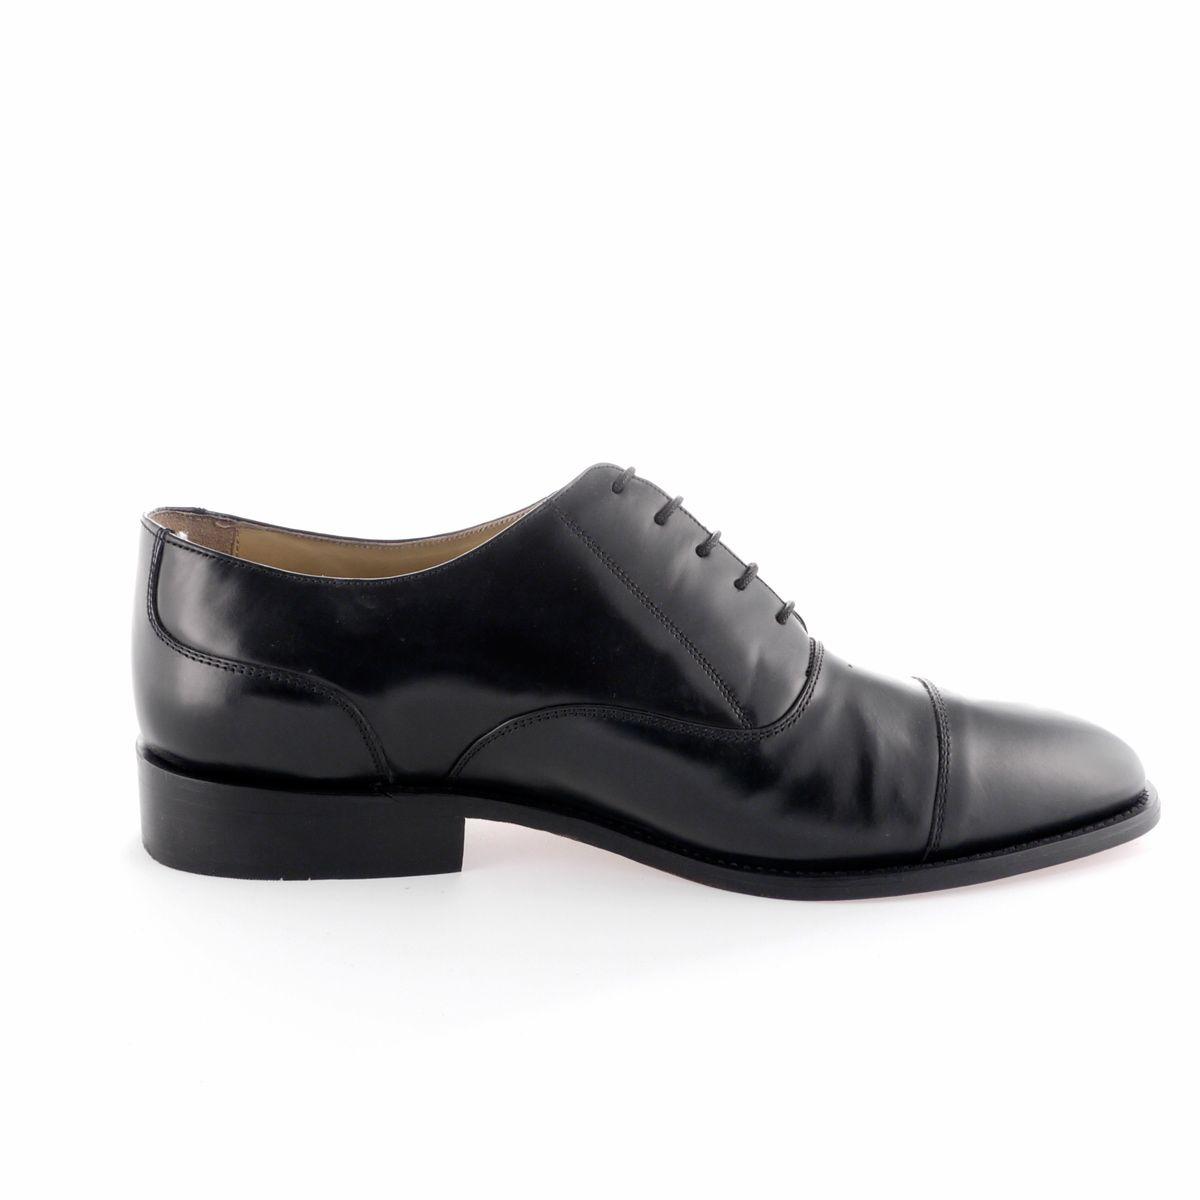 chaussures en cuir sp ciales pieds larges kensington classics. Black Bedroom Furniture Sets. Home Design Ideas